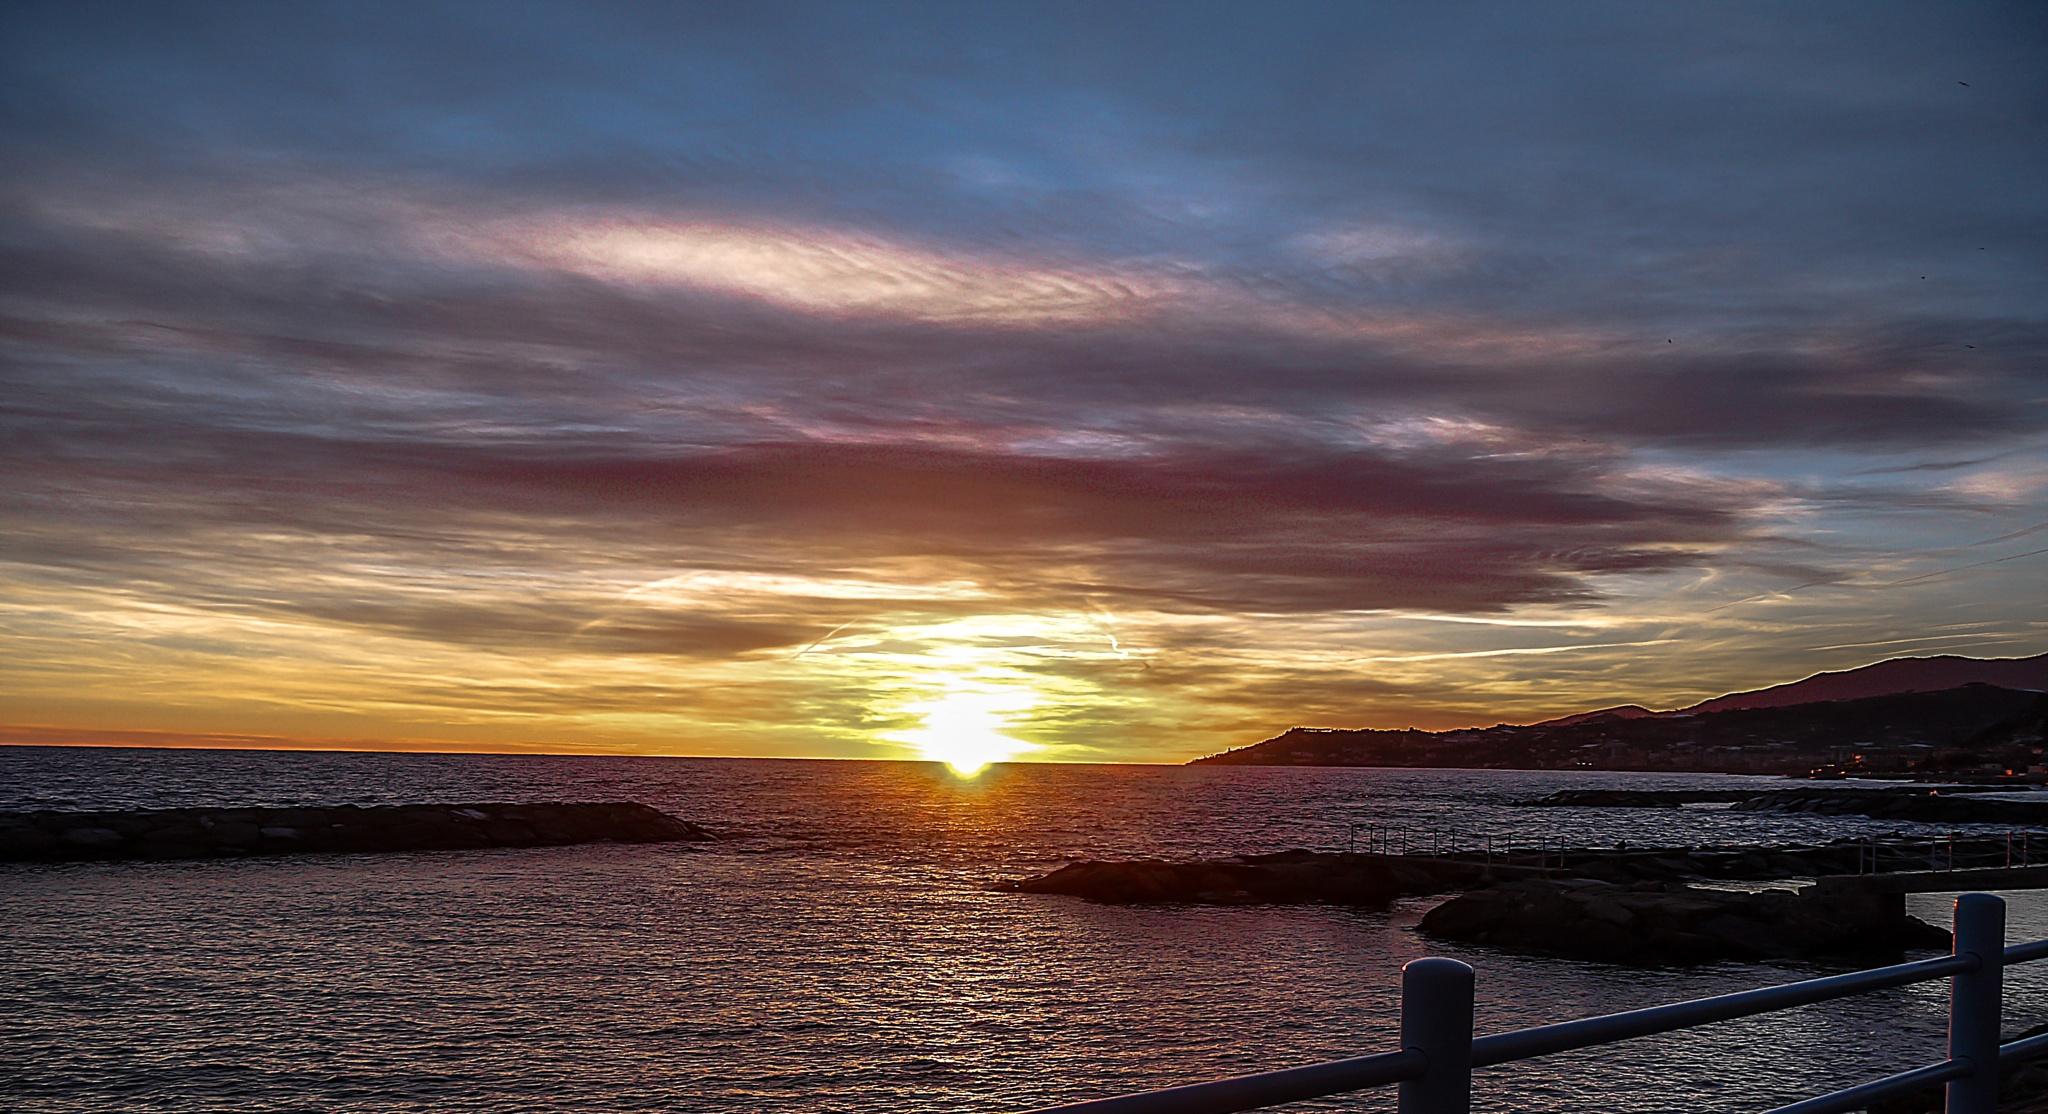 sunset again by iuliacordeanu